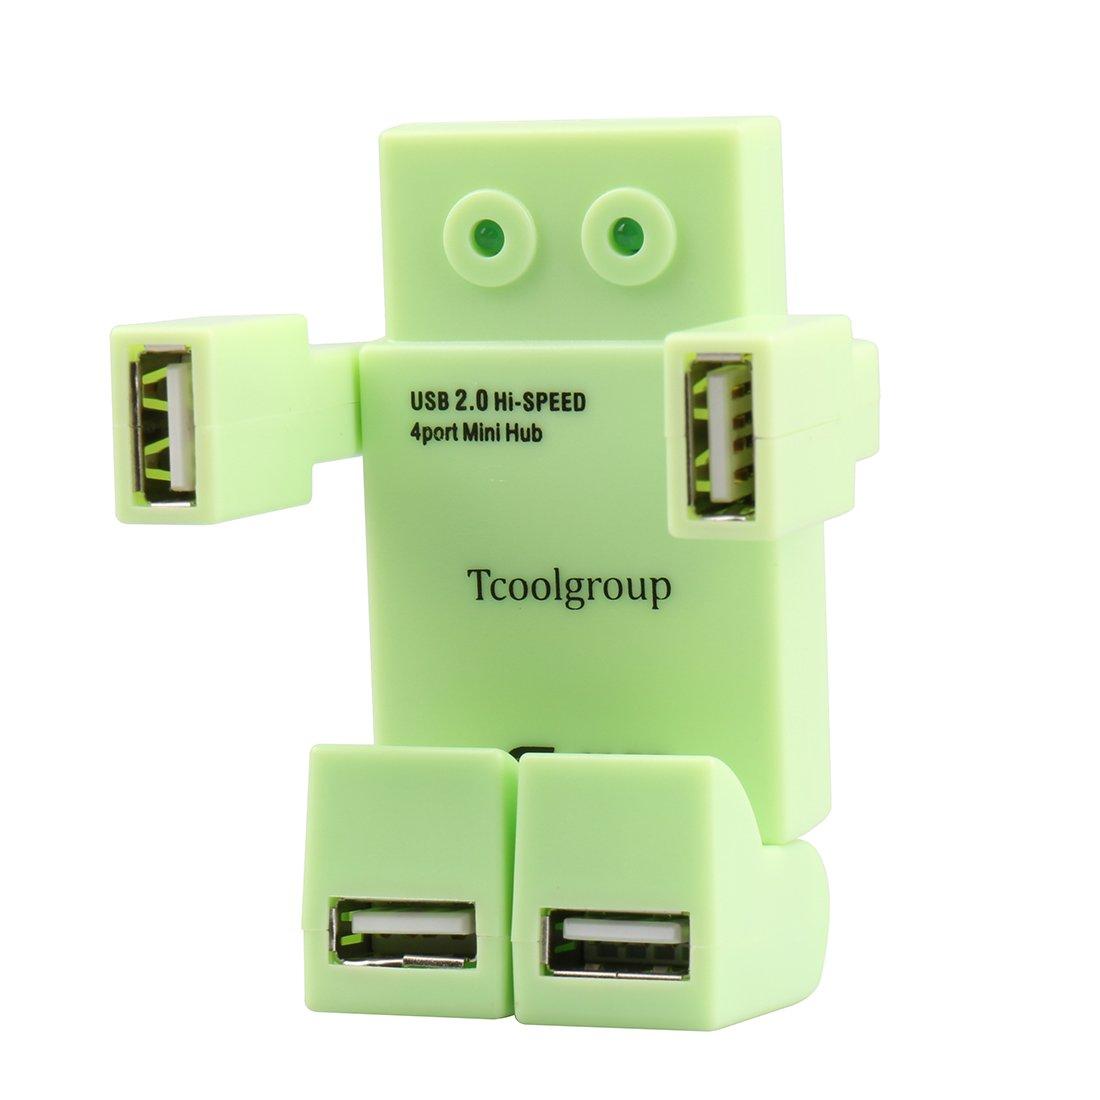 Tcoolgroup Robot Hi Speed 4 Port Usb Hub For Windows Xp 4port Vista 7 8 Linux Mac Os Desktop Pc Laptop Including A Mini Cable